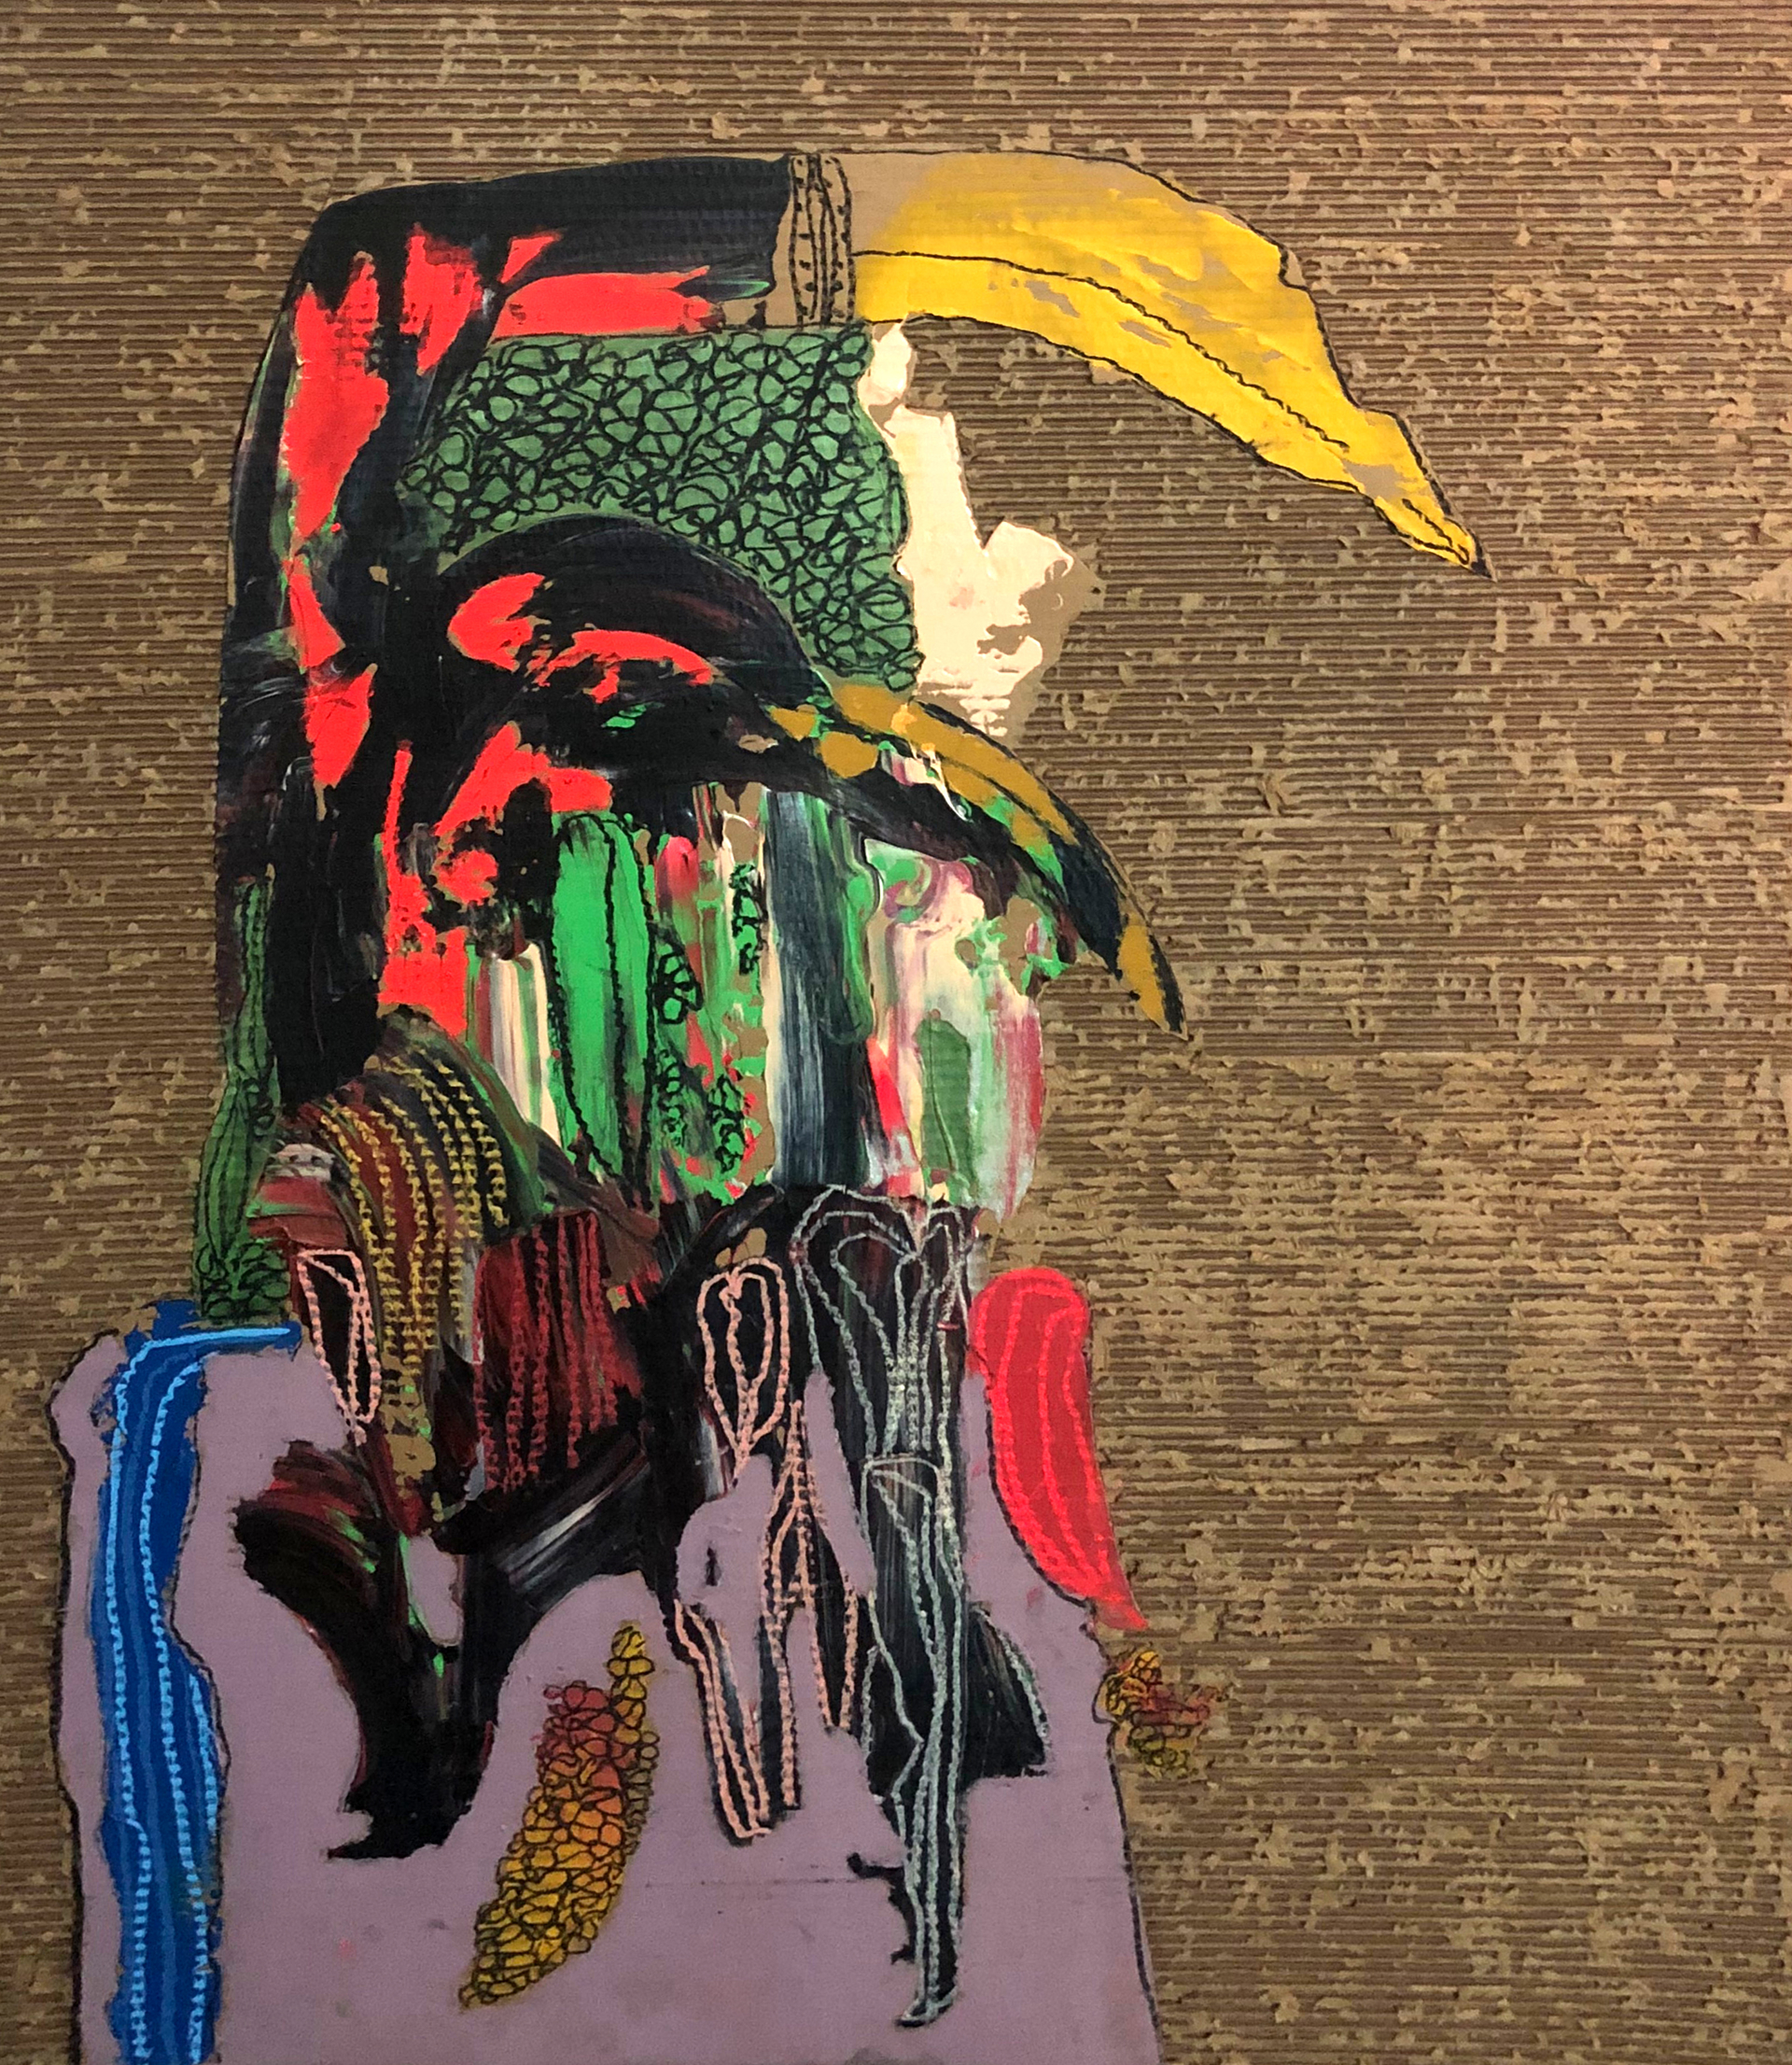 Indigenous Contemporary No. 78 by Jonathan Paul Jackson